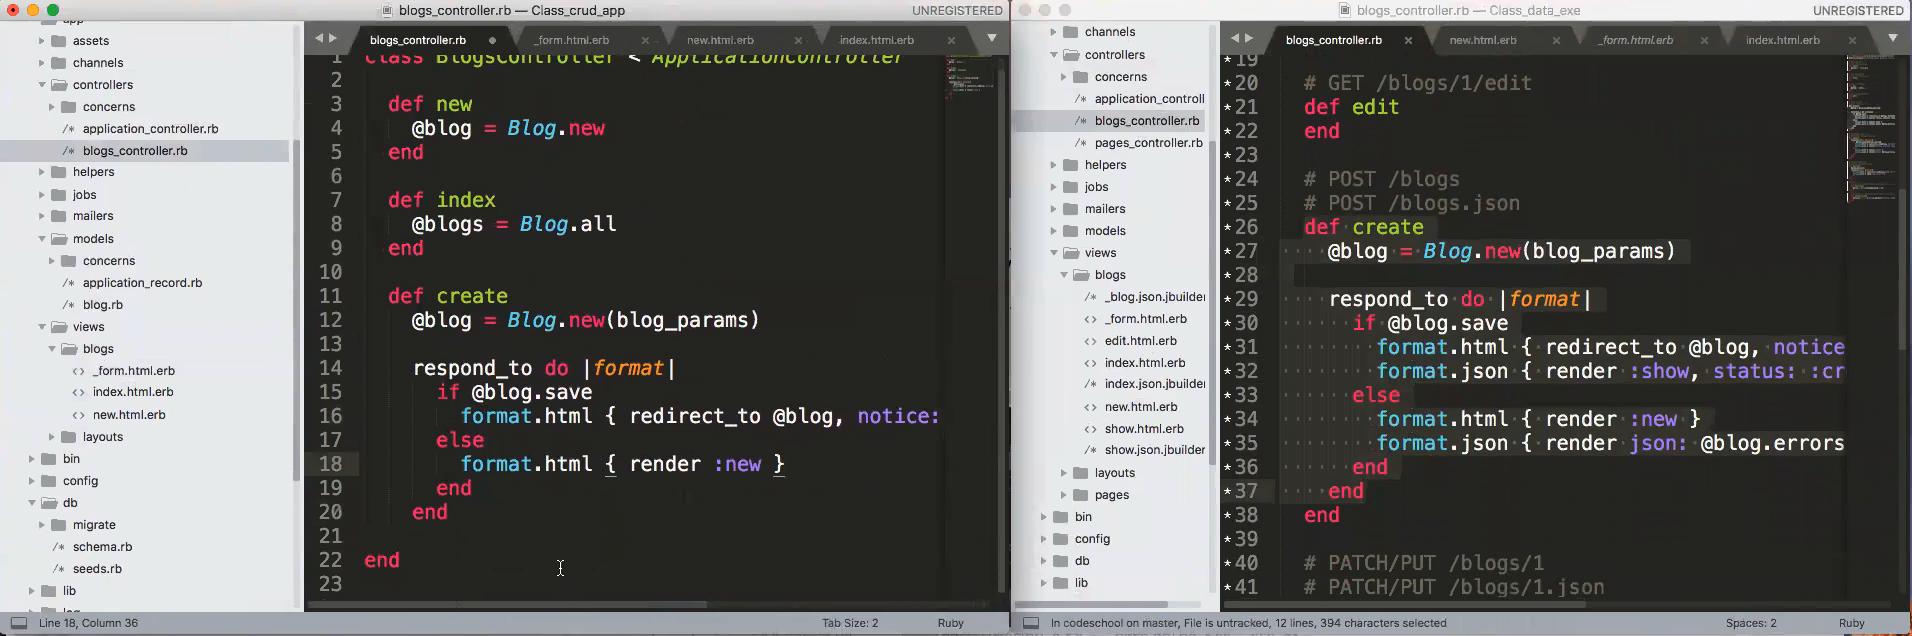 Webinar: Overview of CRUD in Rails